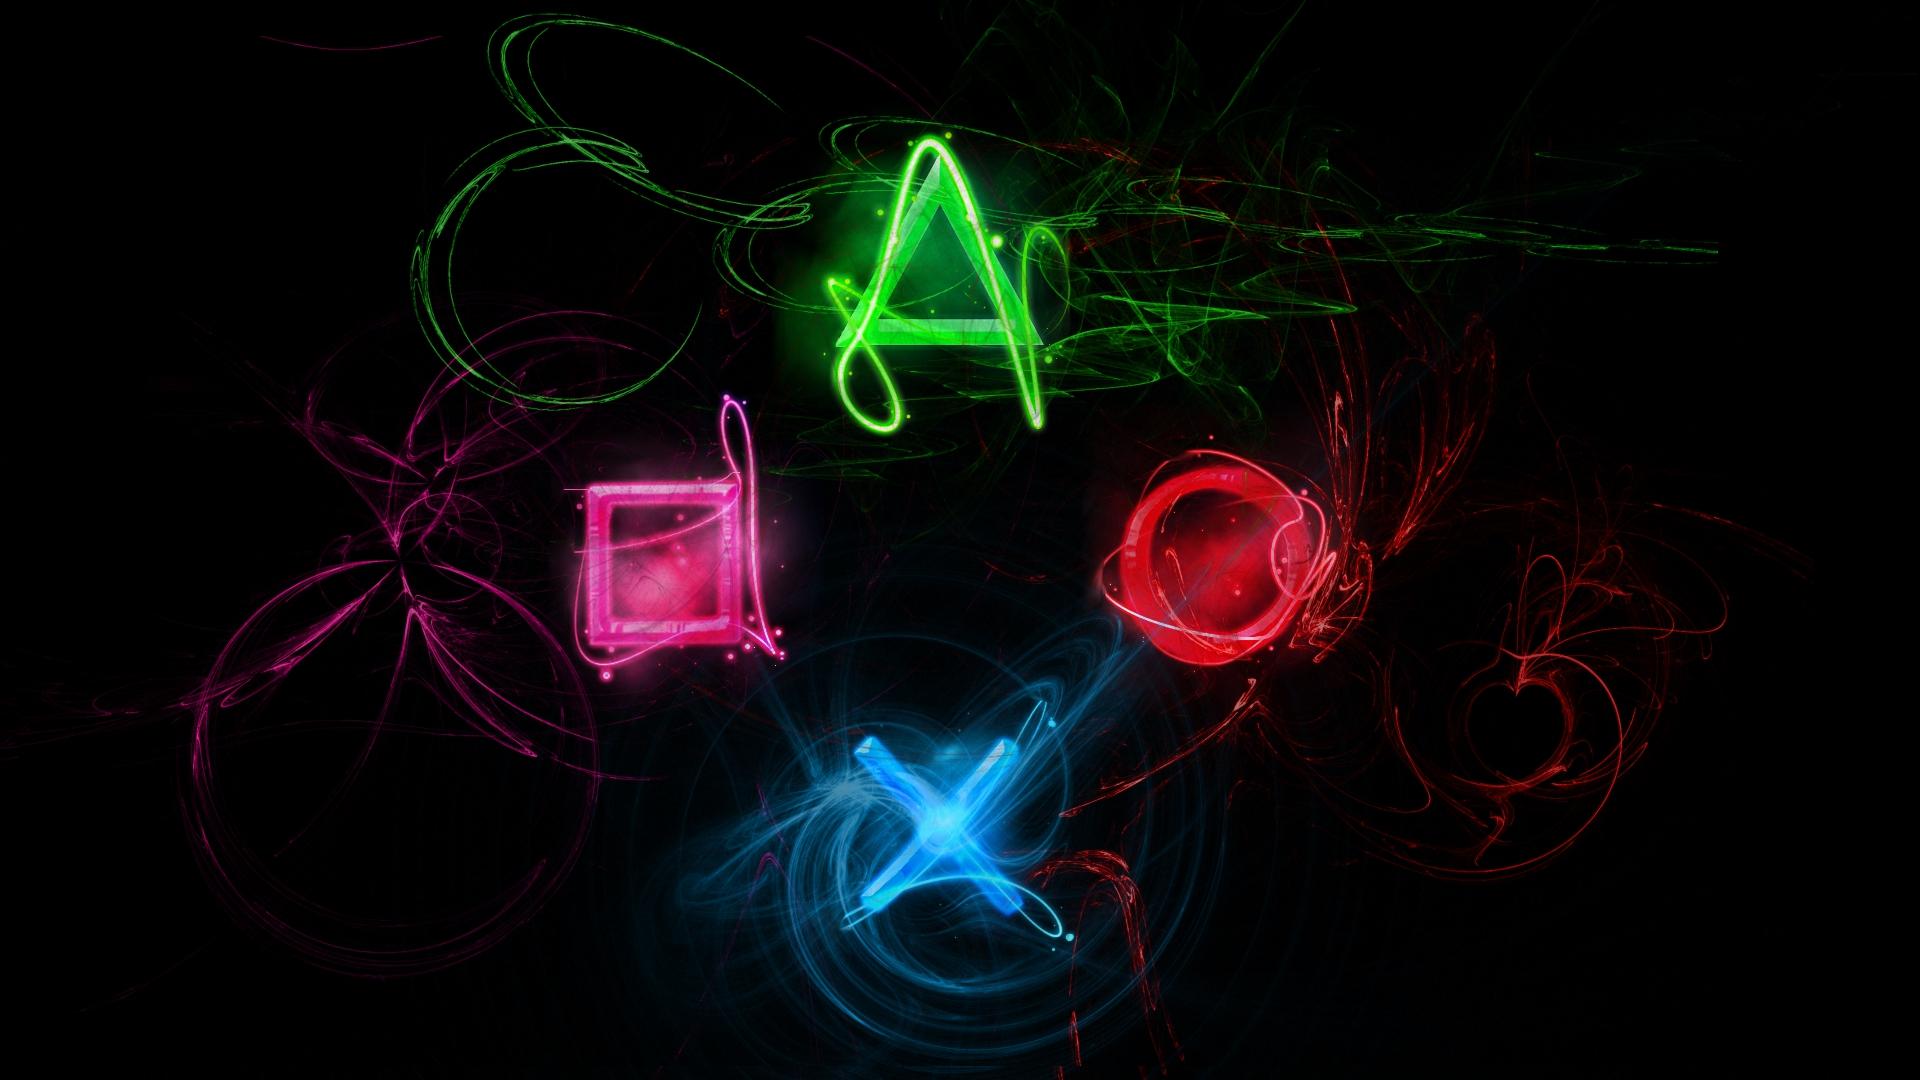 47 Sony Playstation Wallpaper On Wallpapersafari